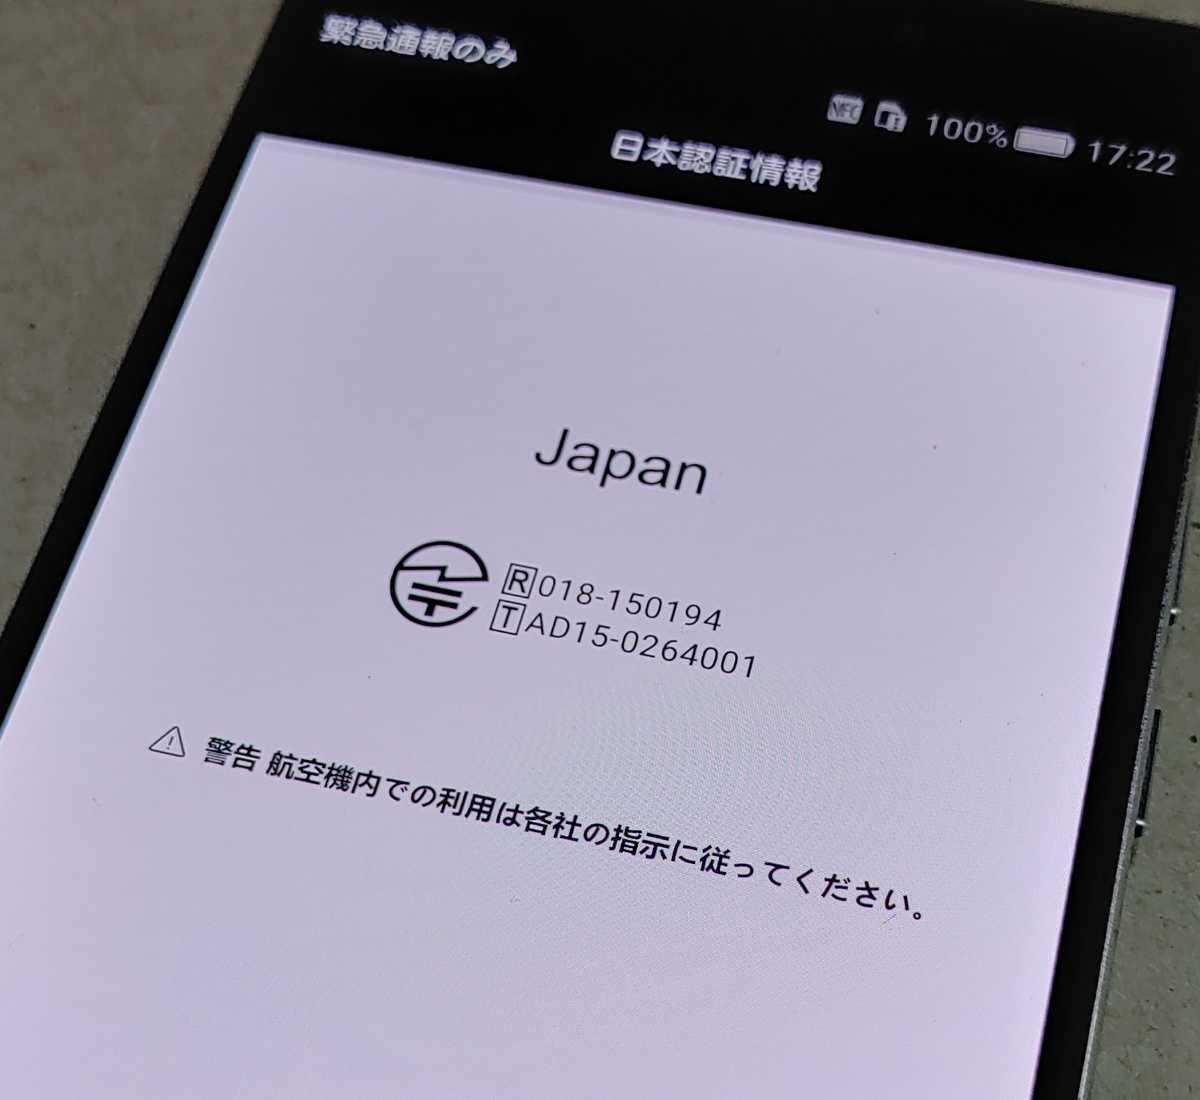 SIMフリースマートフォン HUAWEI Mate S 中古品 難あり品 動作可 Androidバージョン5.1.1 送料198円~ 各種発送対応 ファーウェイ CRR-L09_画像5